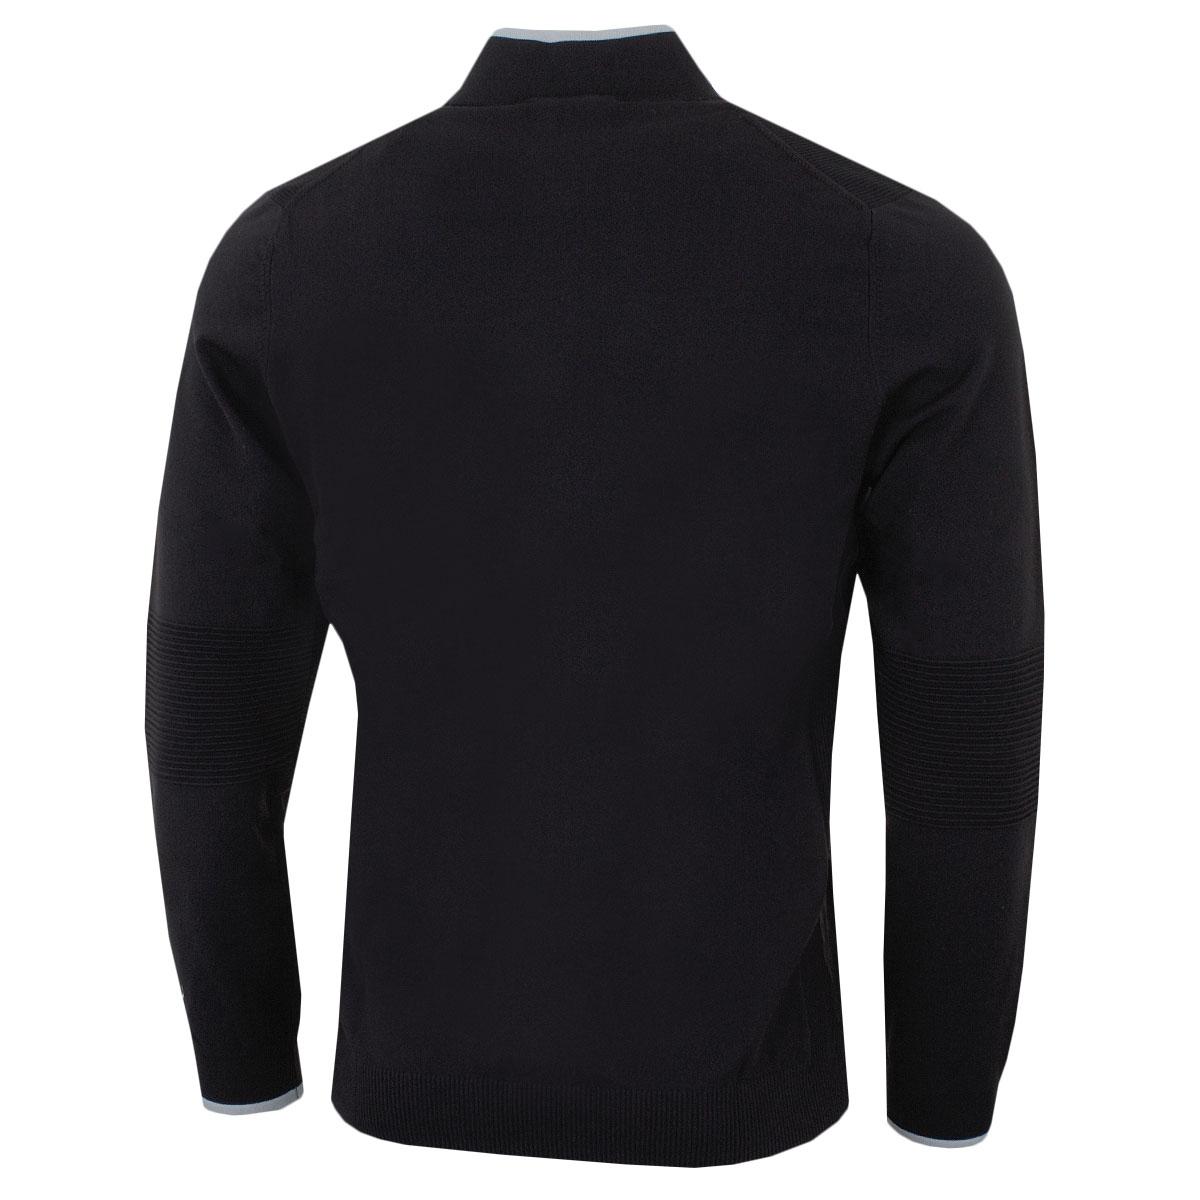 Puma-Golf-Mens-Evoknit-1-4-Zip-Ribbing-Breathable-Sweater-49-OFF-RRP thumbnail 3